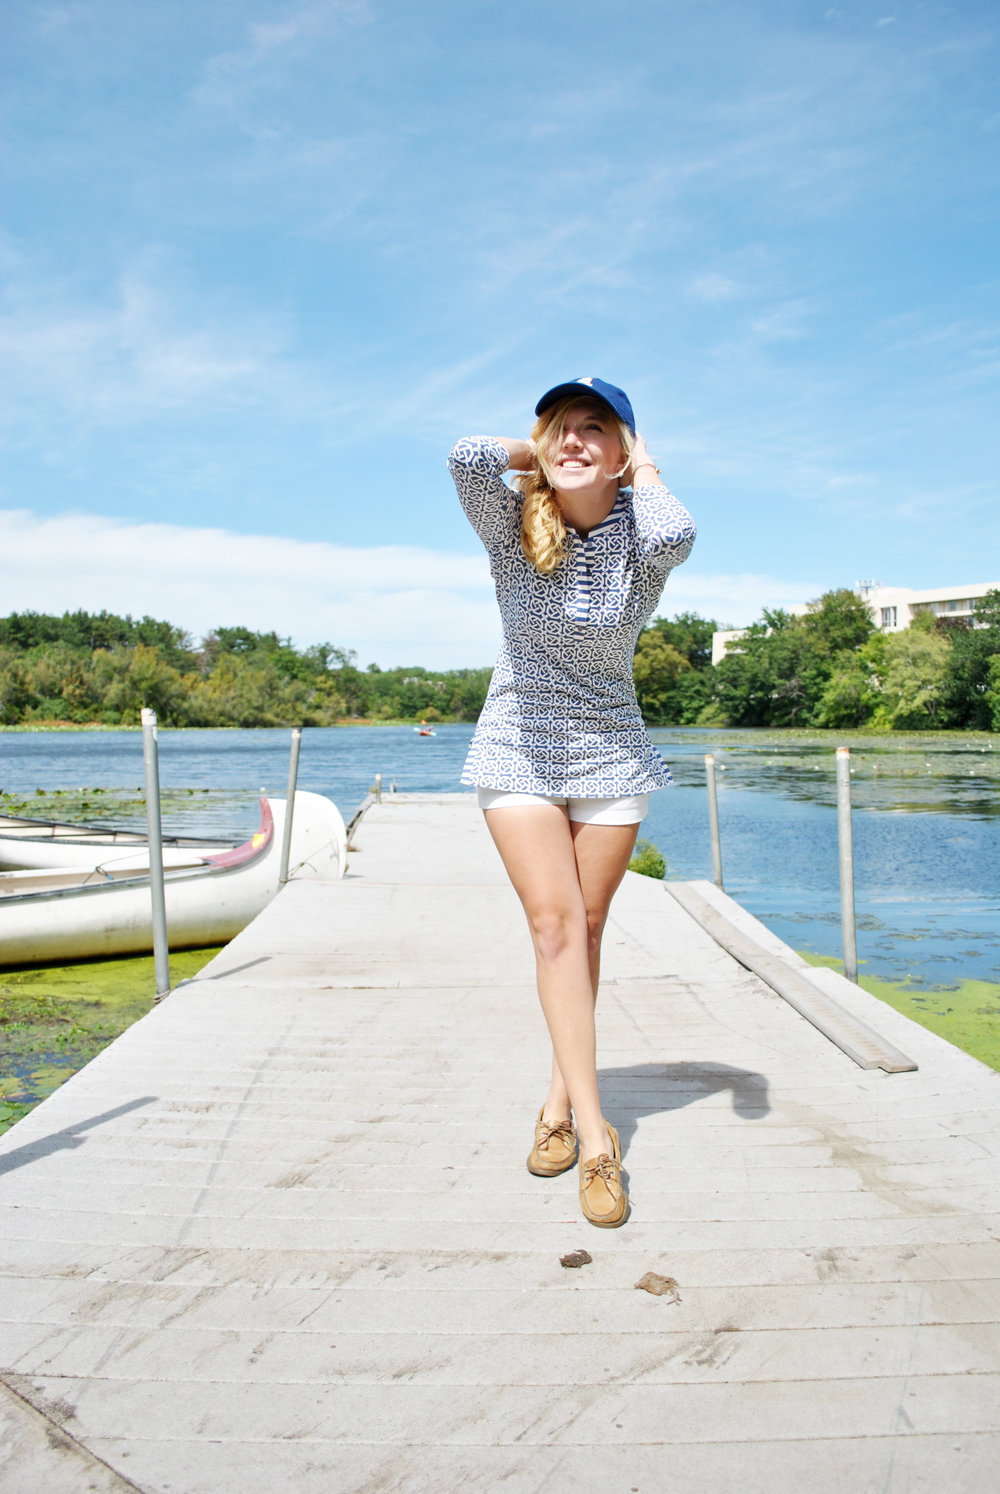 thoughtfulwish | smathers & branson // baseball cap // sailing // sailboat // fblog // fashion blogger // boston // new england fashion // j.mclaughlin // kate spade // meredith wish // boston